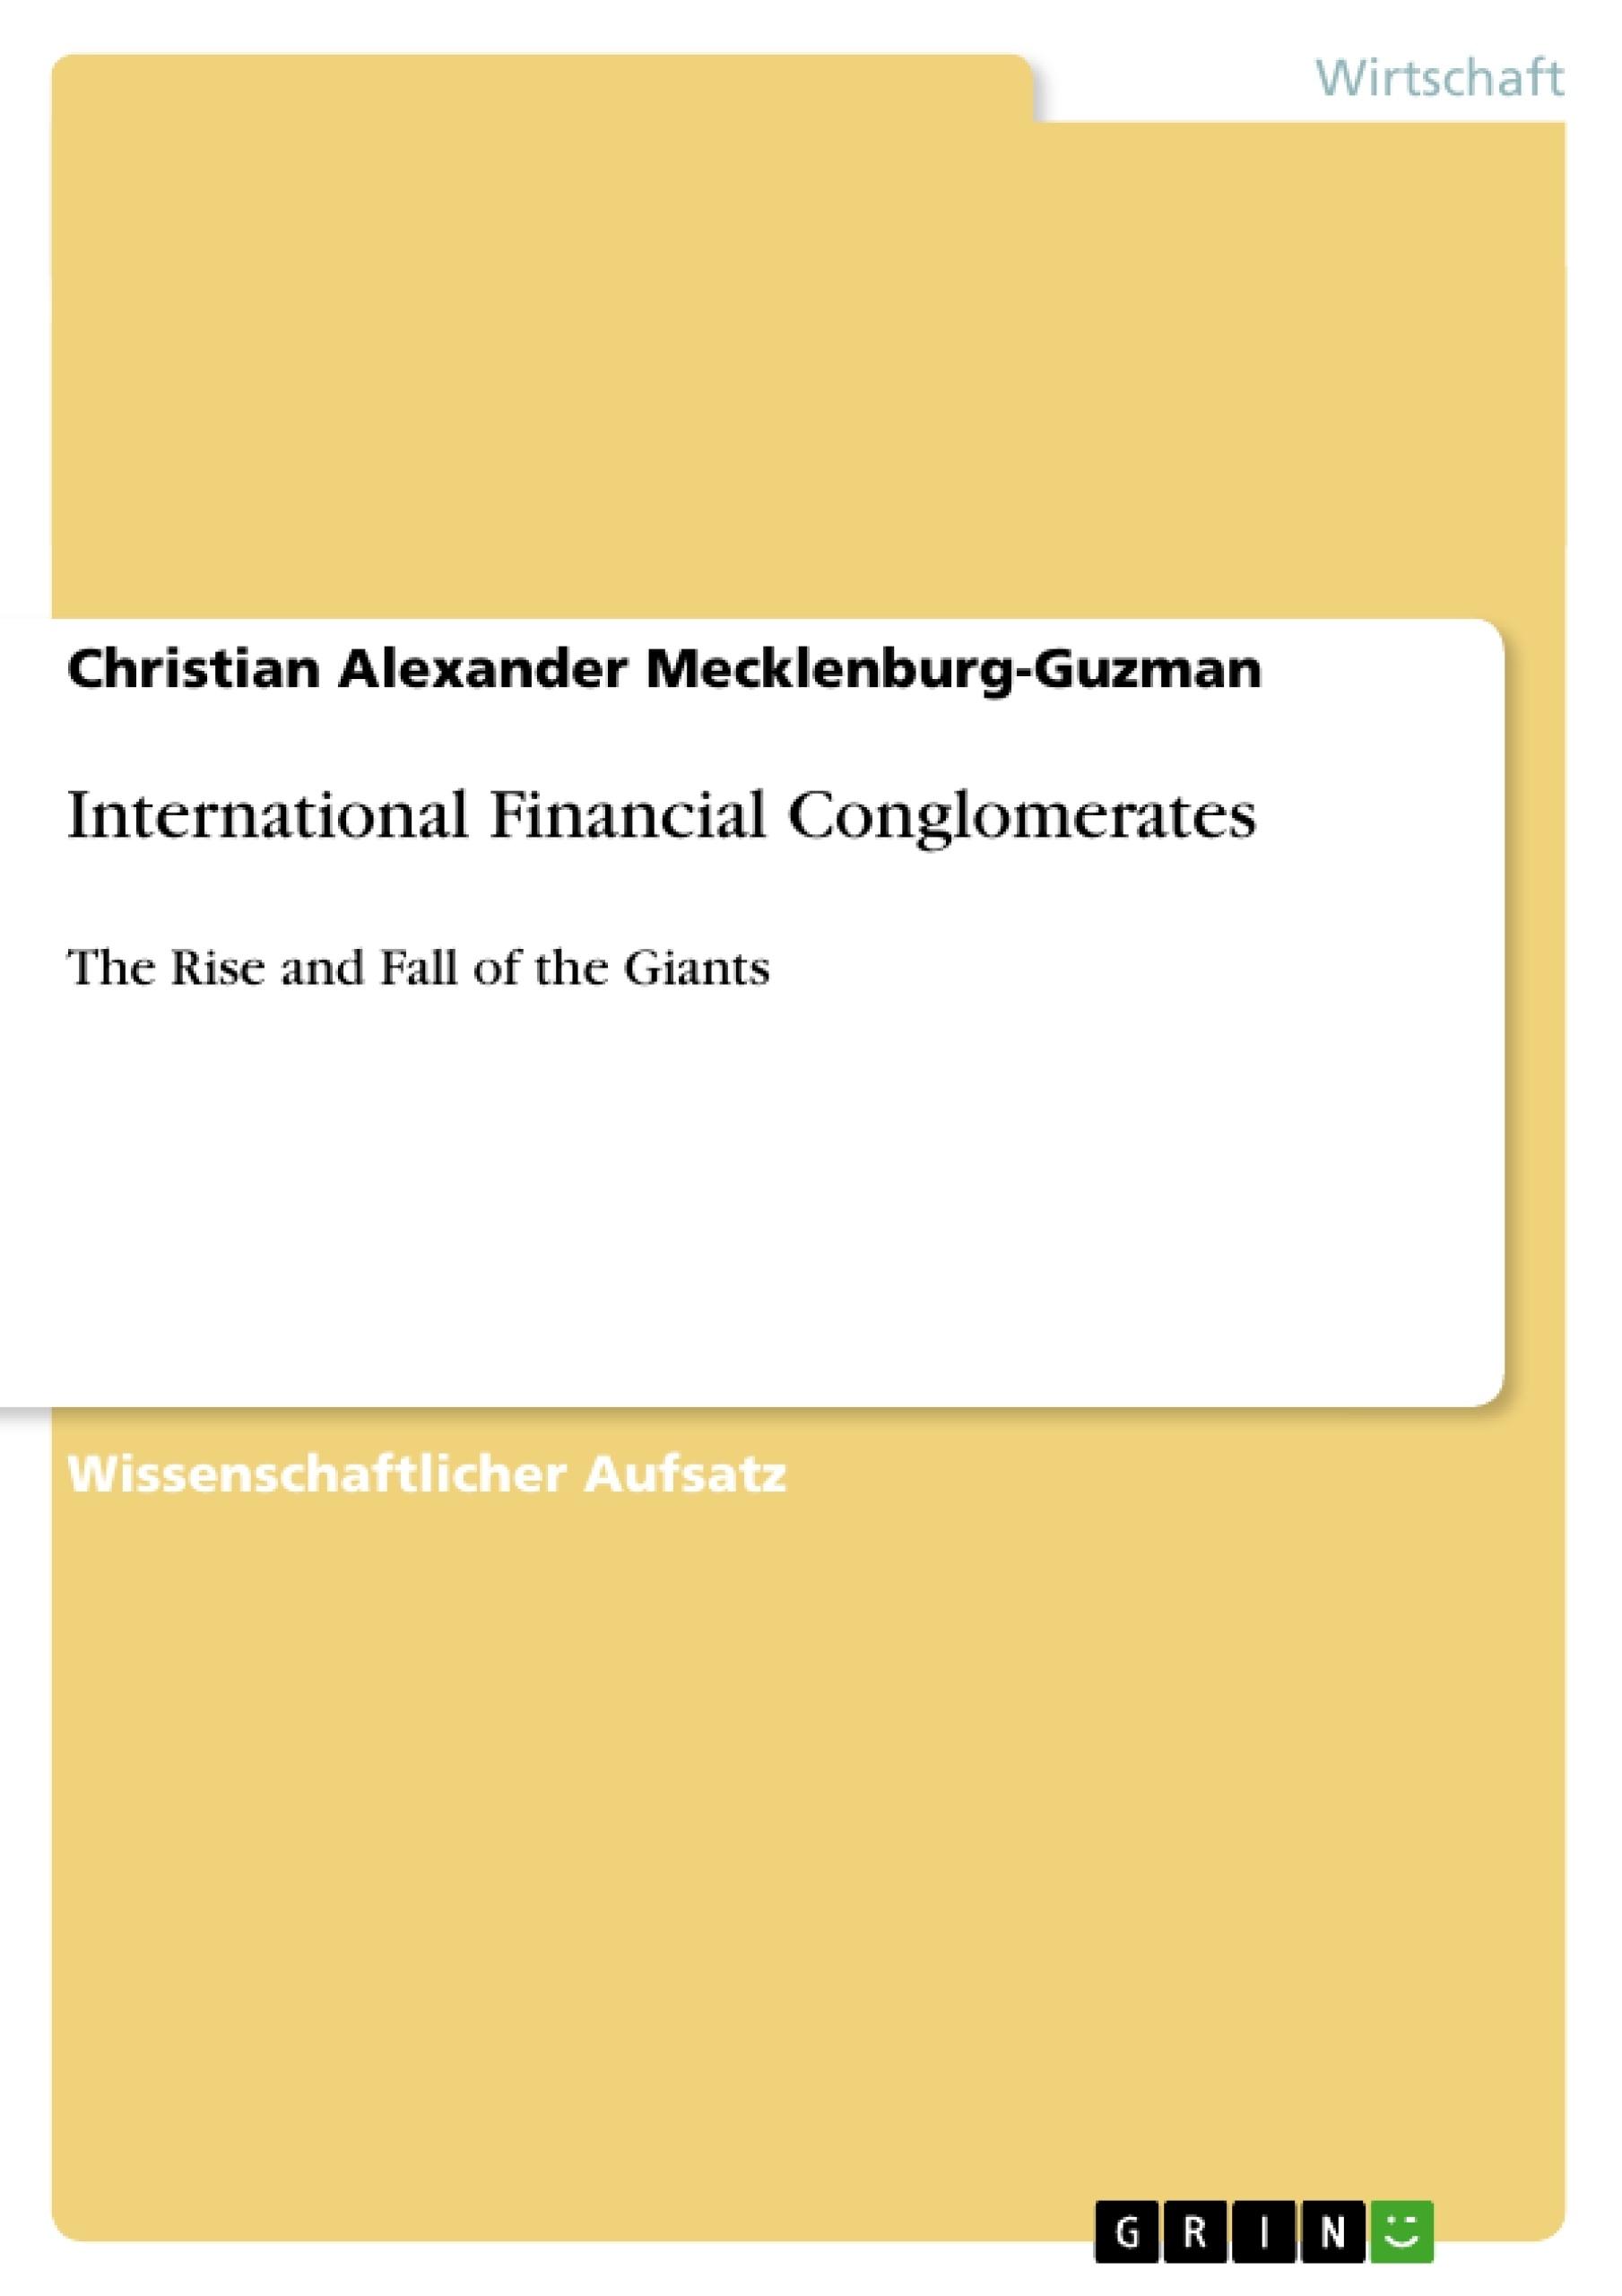 Titel: International Financial Conglomerates